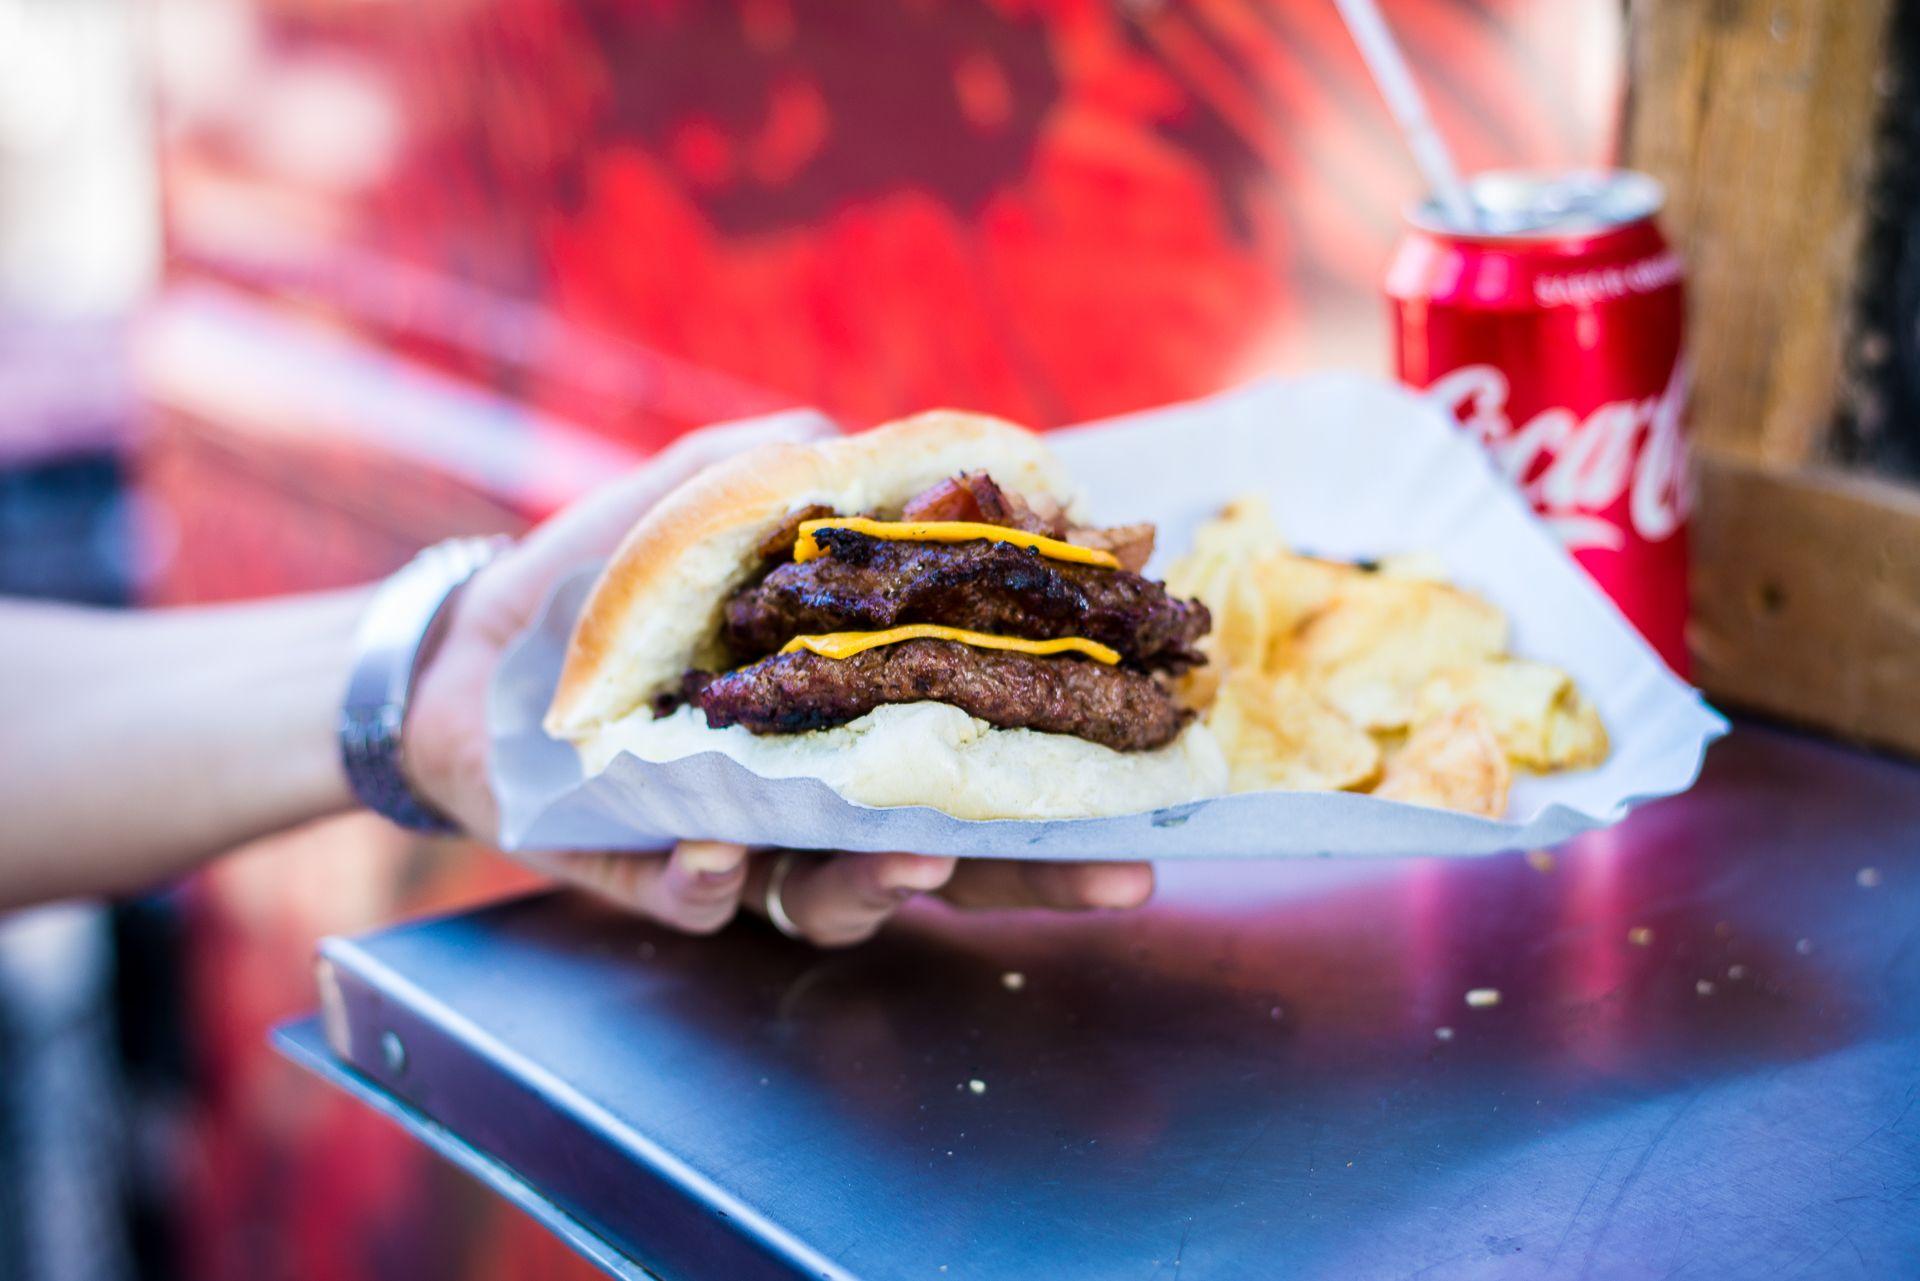 ¿Cómo tiene que ser la hamburguesa argentina ideal?